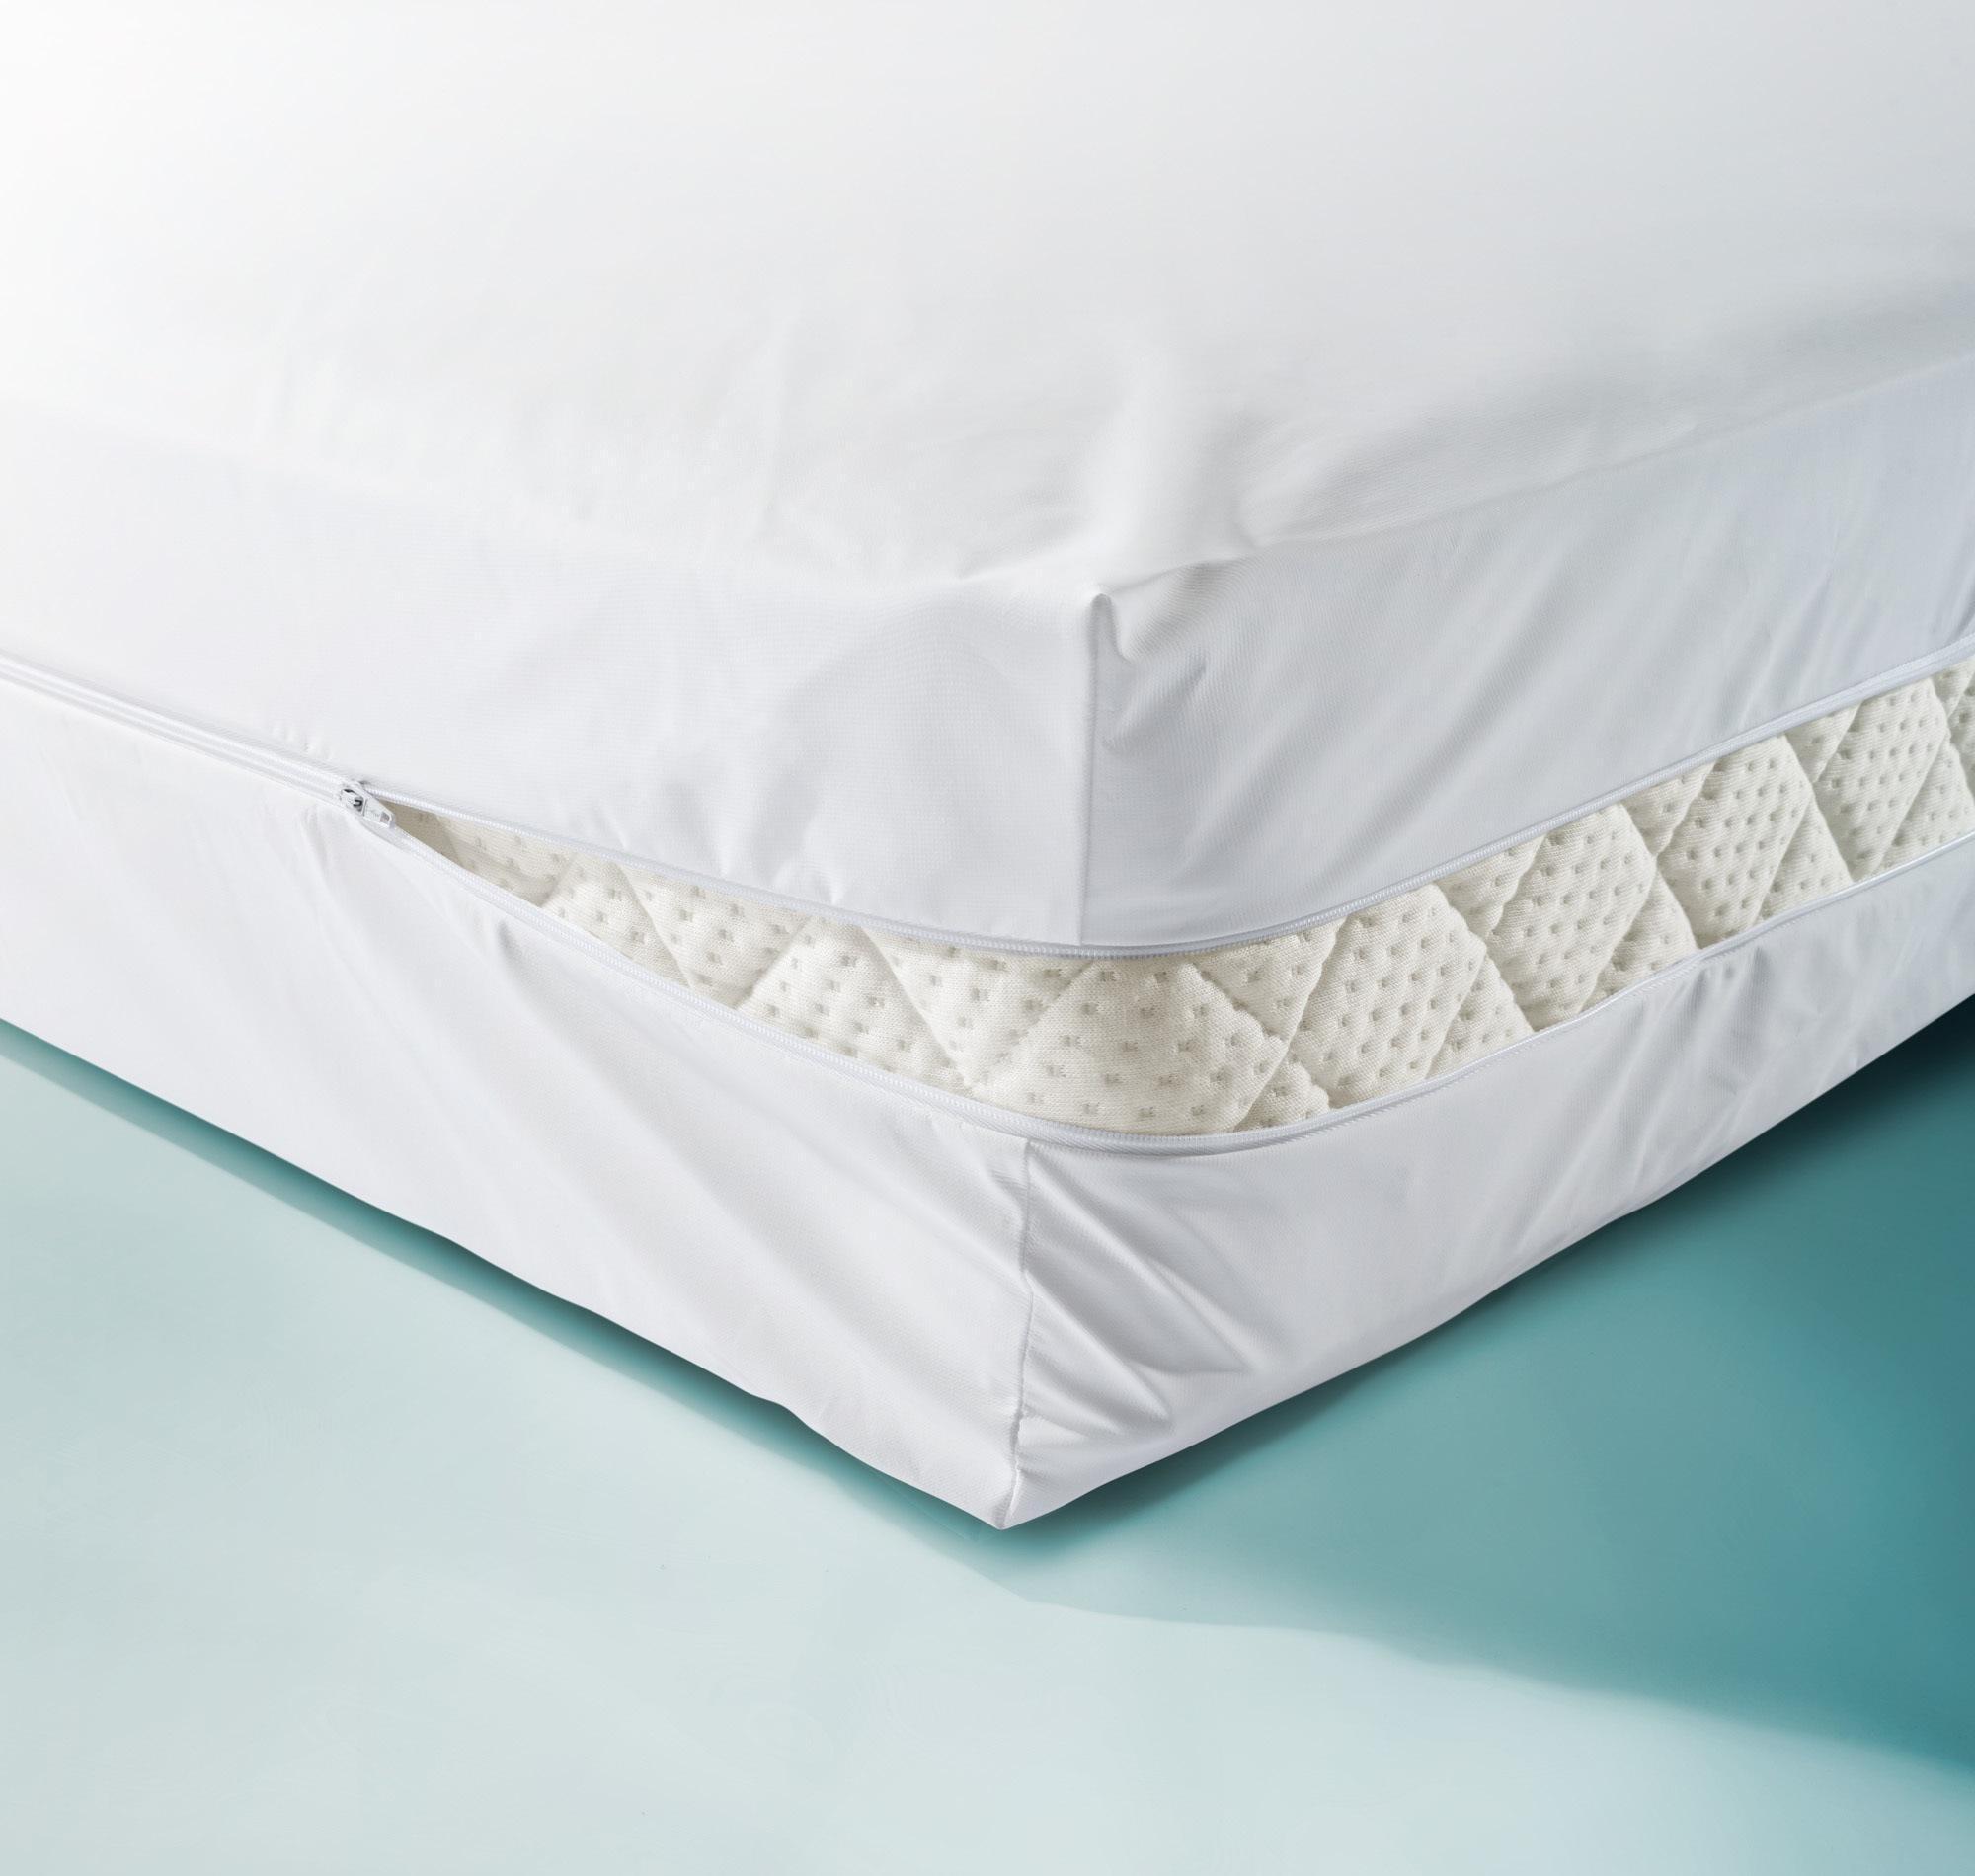 wasserdichter matratzenbezug 190x80. Black Bedroom Furniture Sets. Home Design Ideas